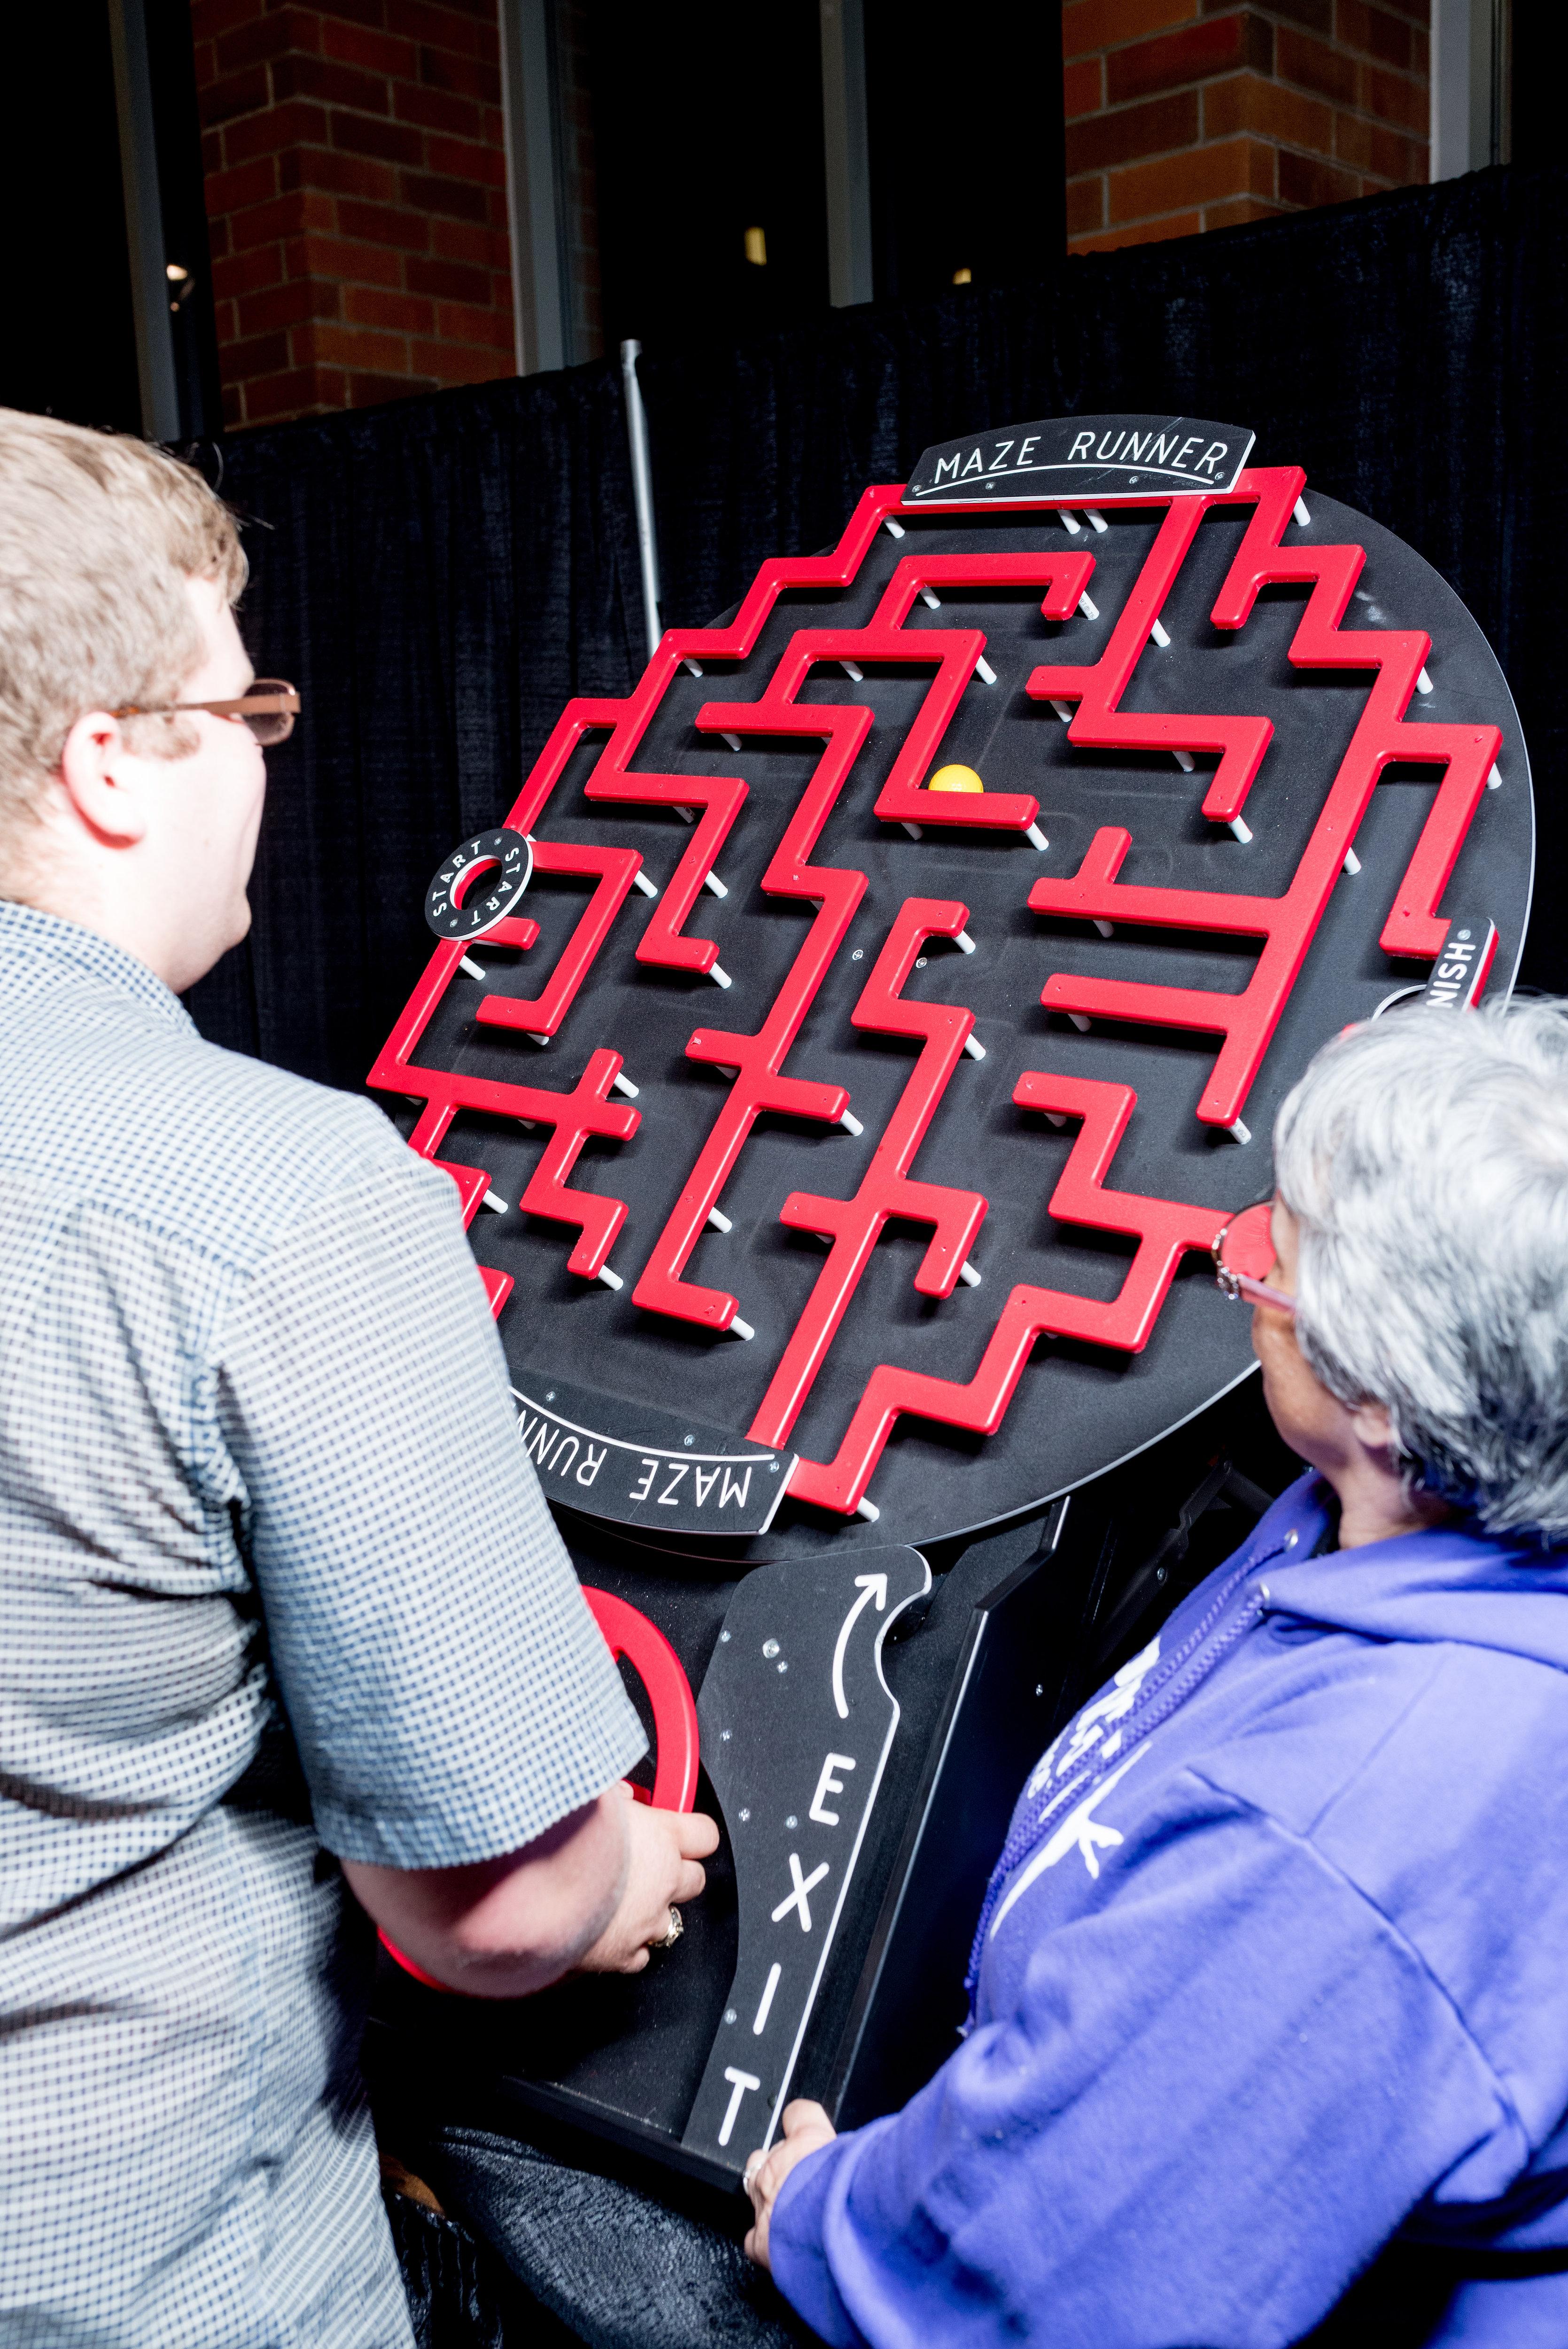 Spokane Carnival Rentals Maze Runner